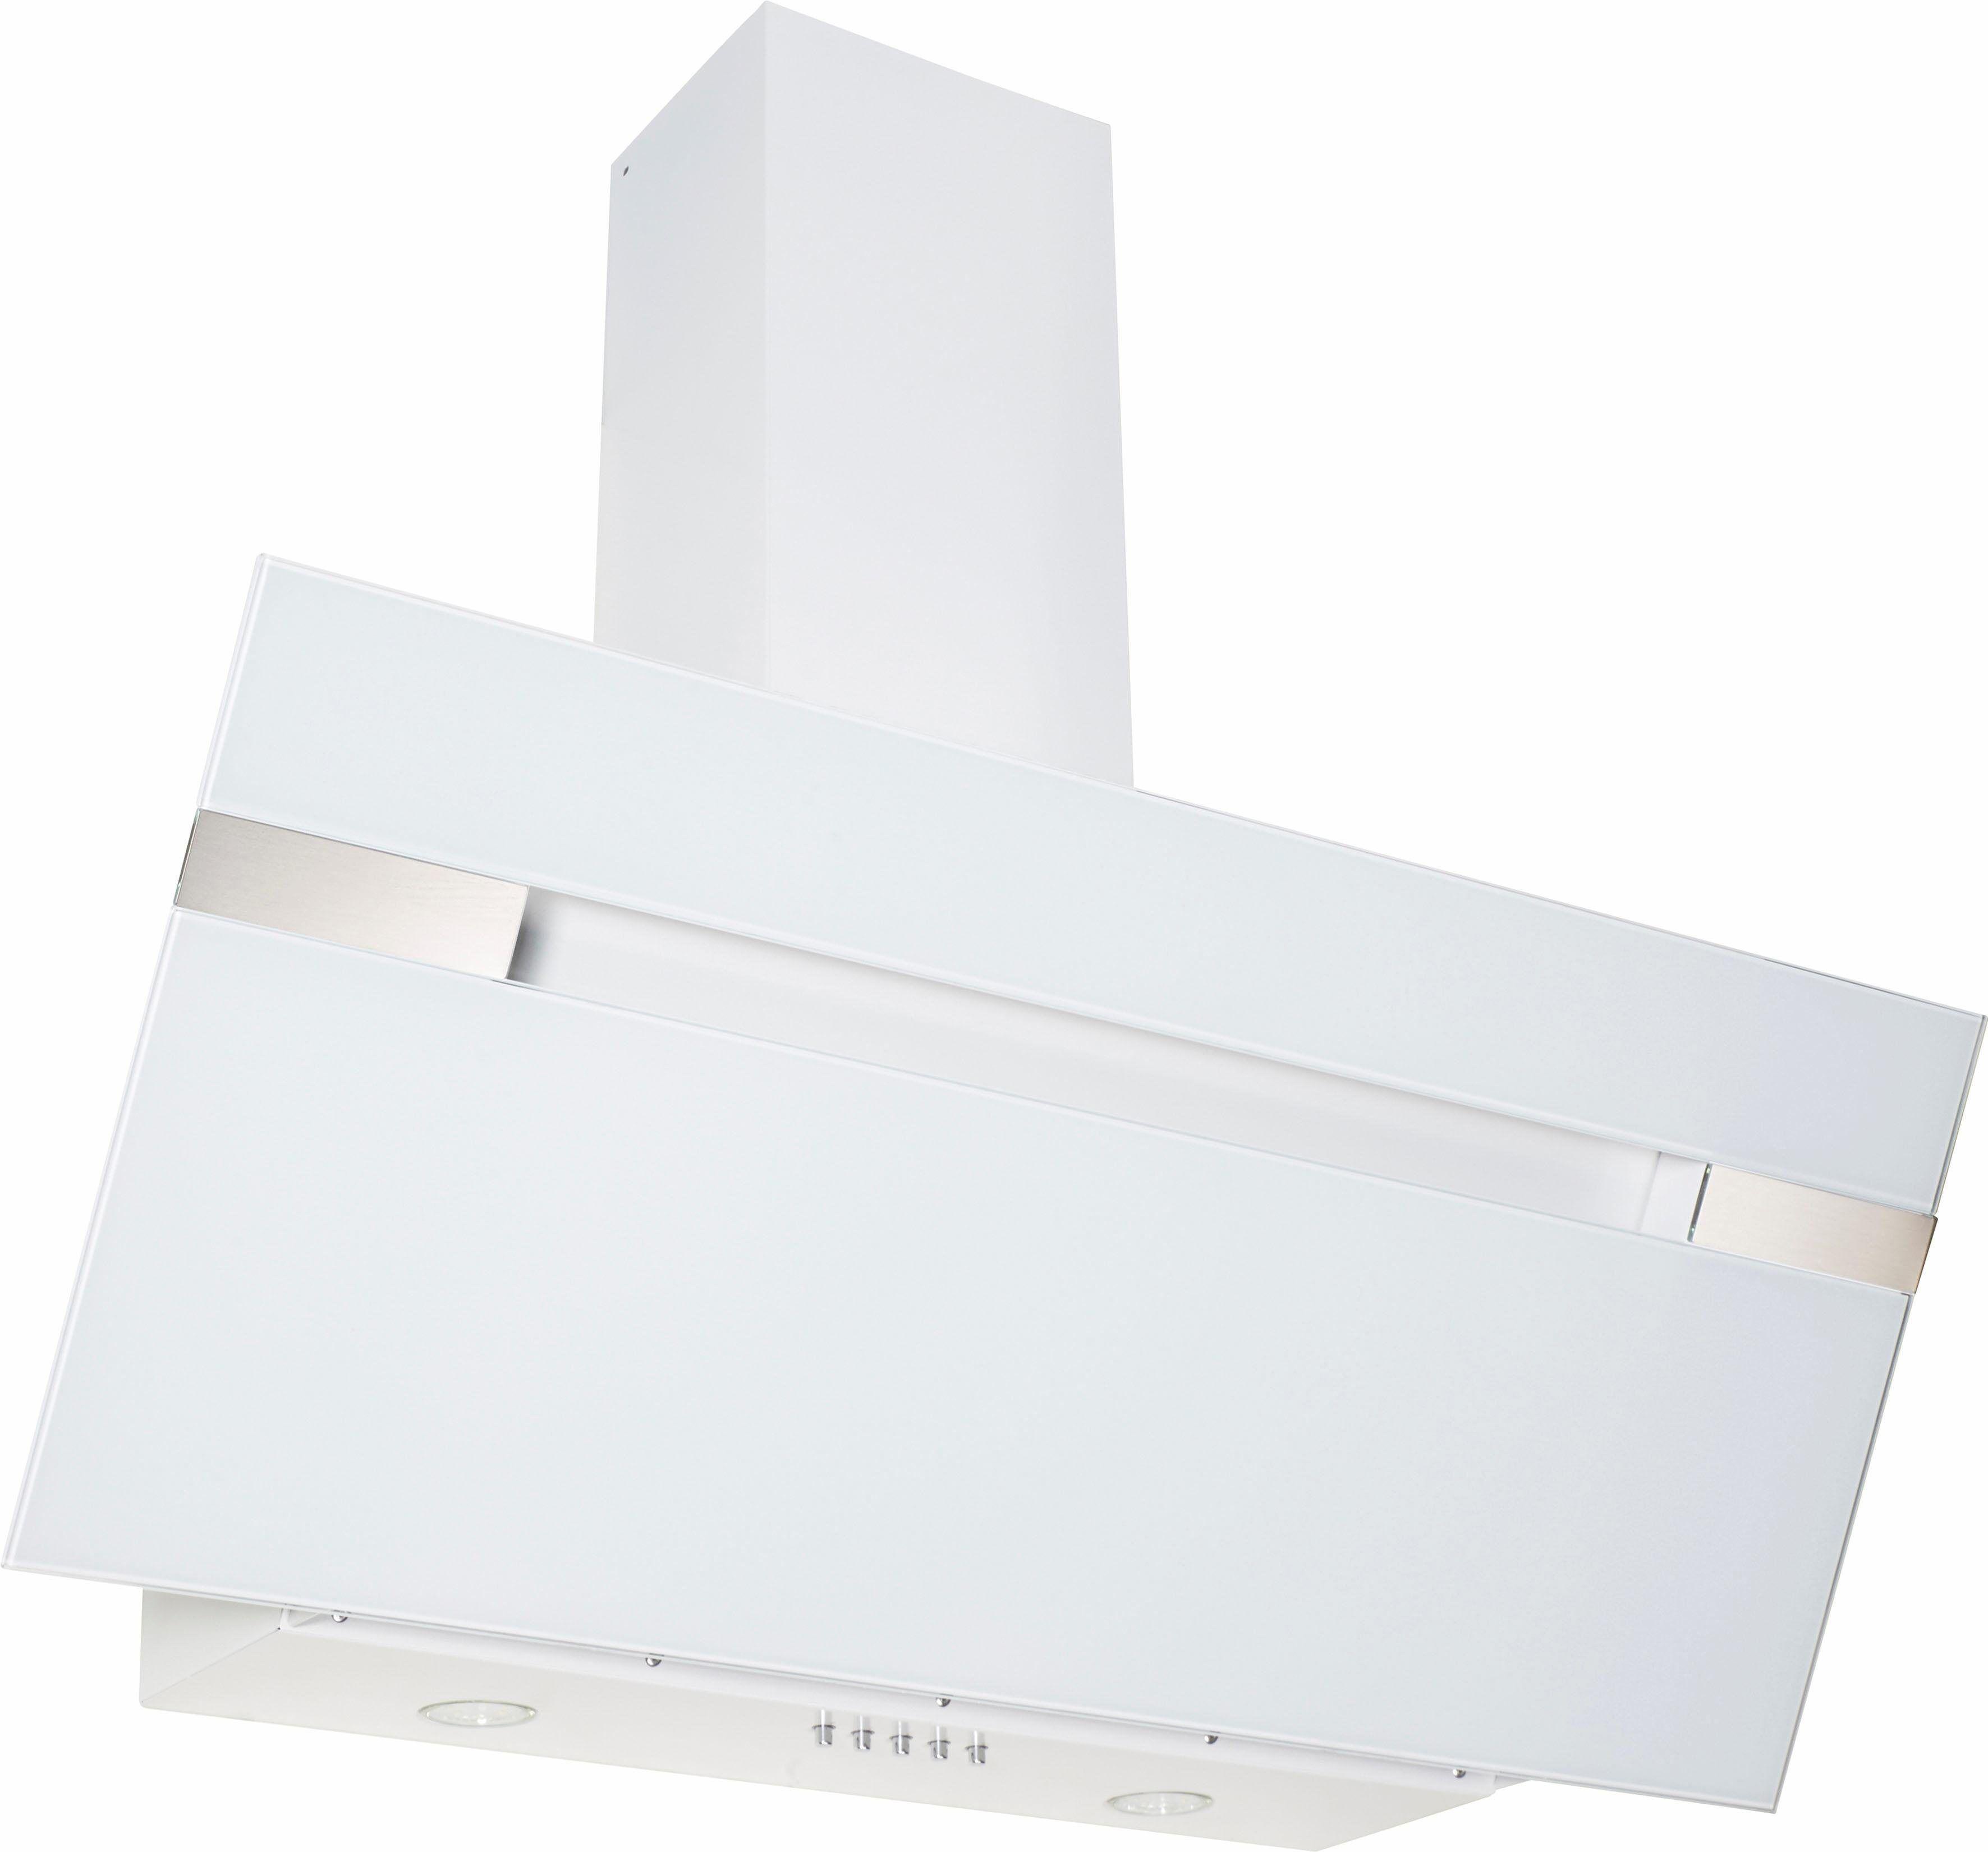 Amica Kopffreihaube KH 17405 W, LED-Beleuchtung, Energieeffizienzklasse B